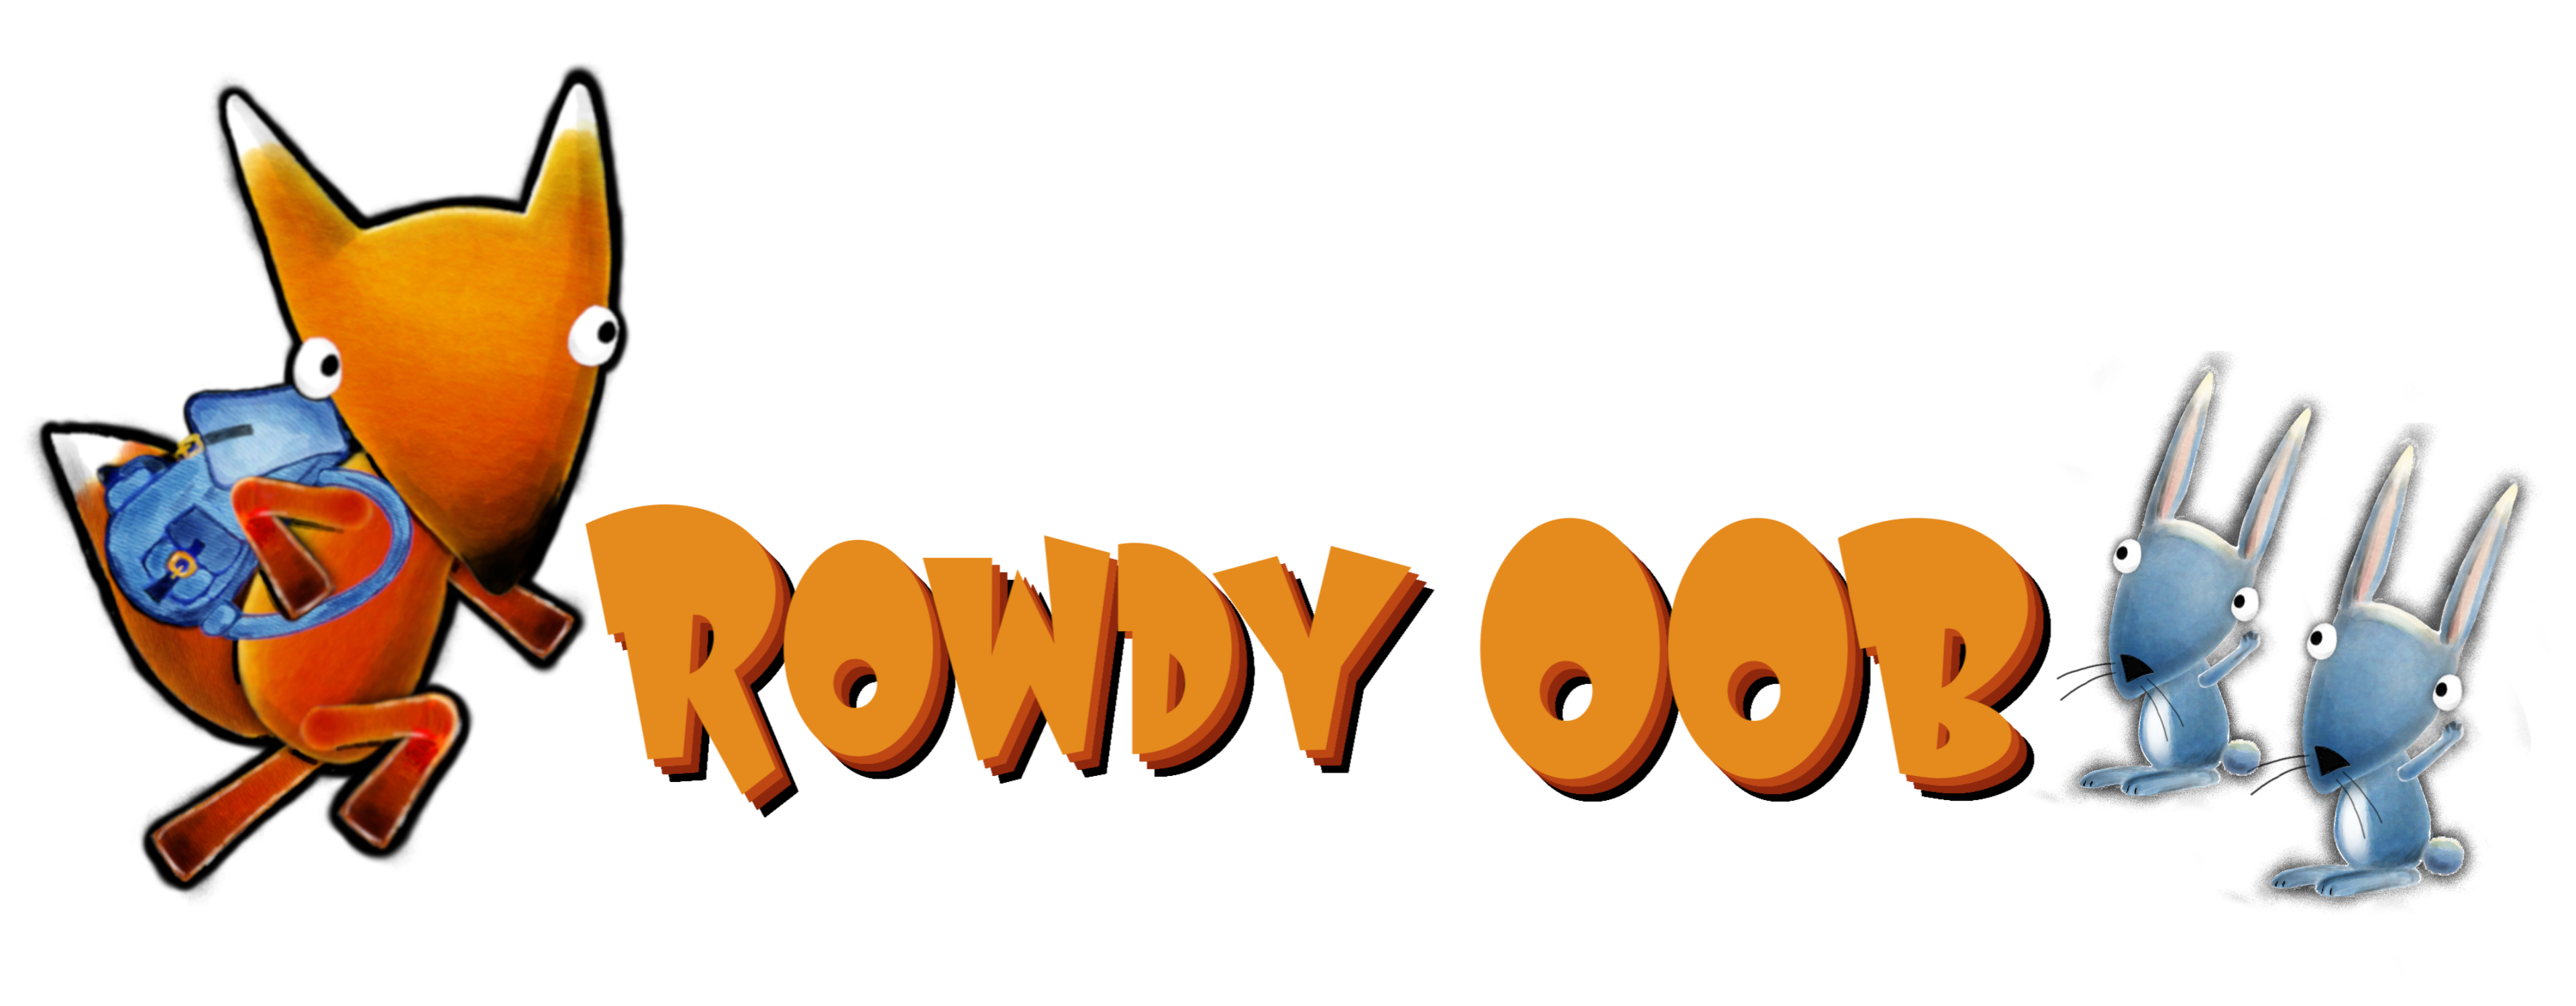 Rowdy OOB